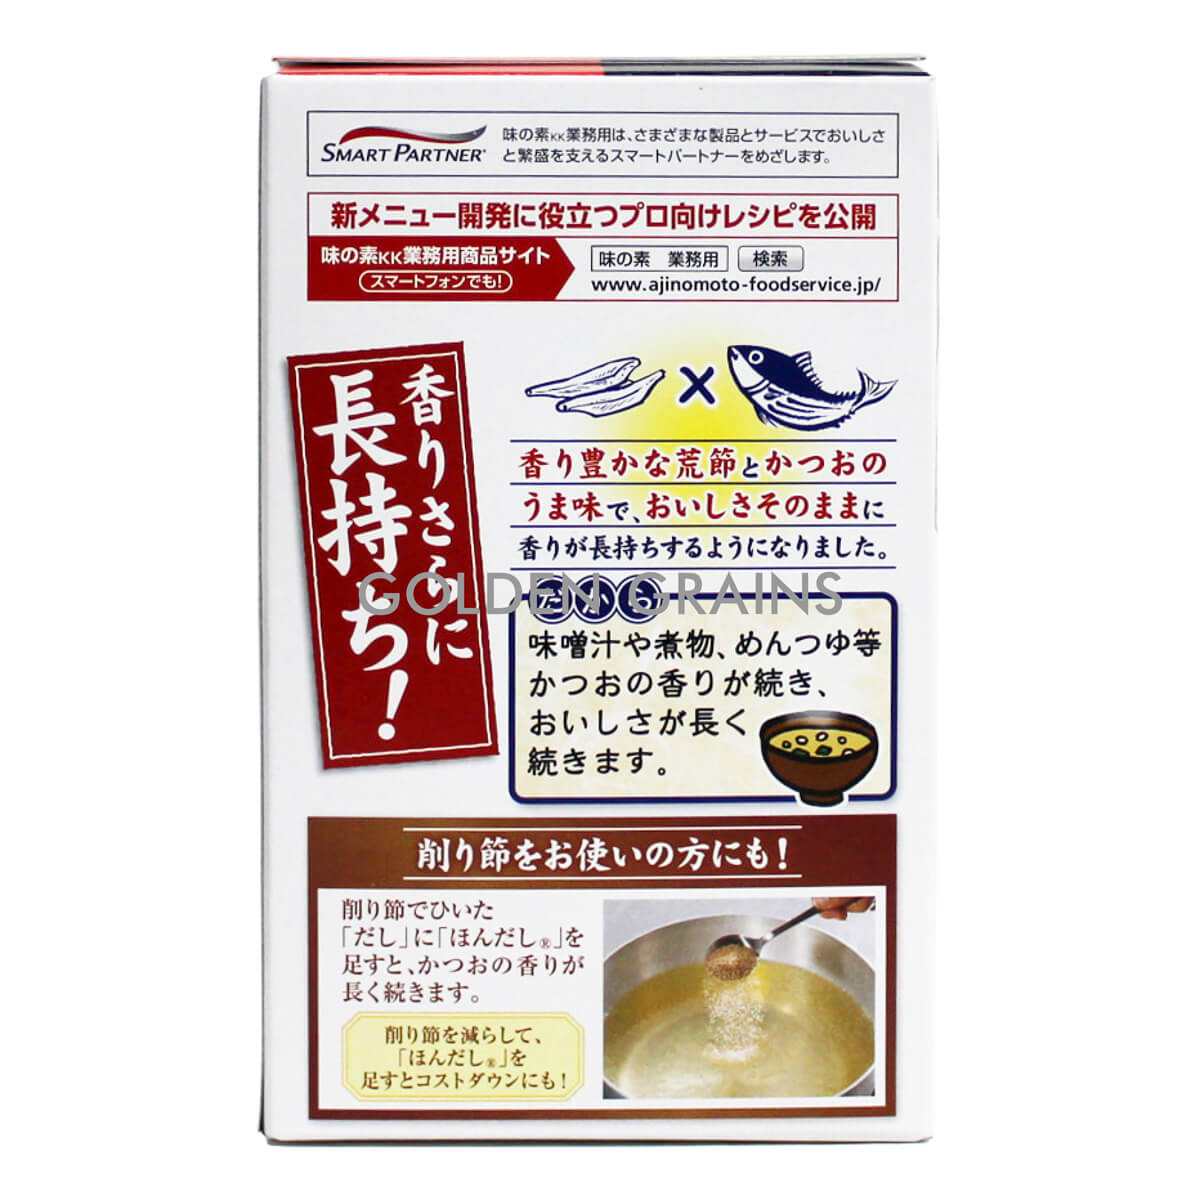 Golden Grains Ajinomoto - Hondashi - Back.jpg